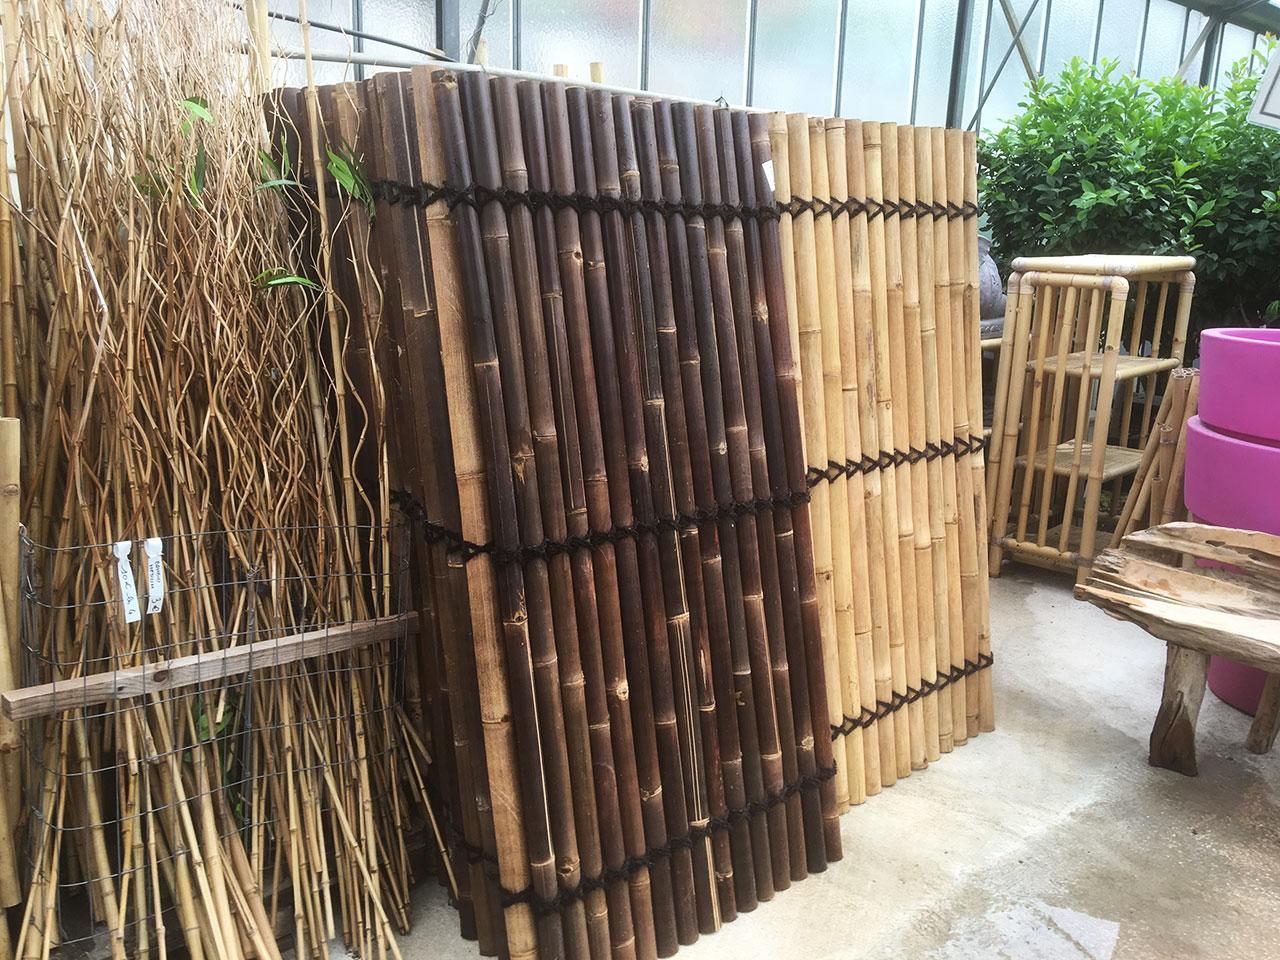 Mur En Bambou - Dewi - L'esprit Jardin tout Deco Jardin Bambou